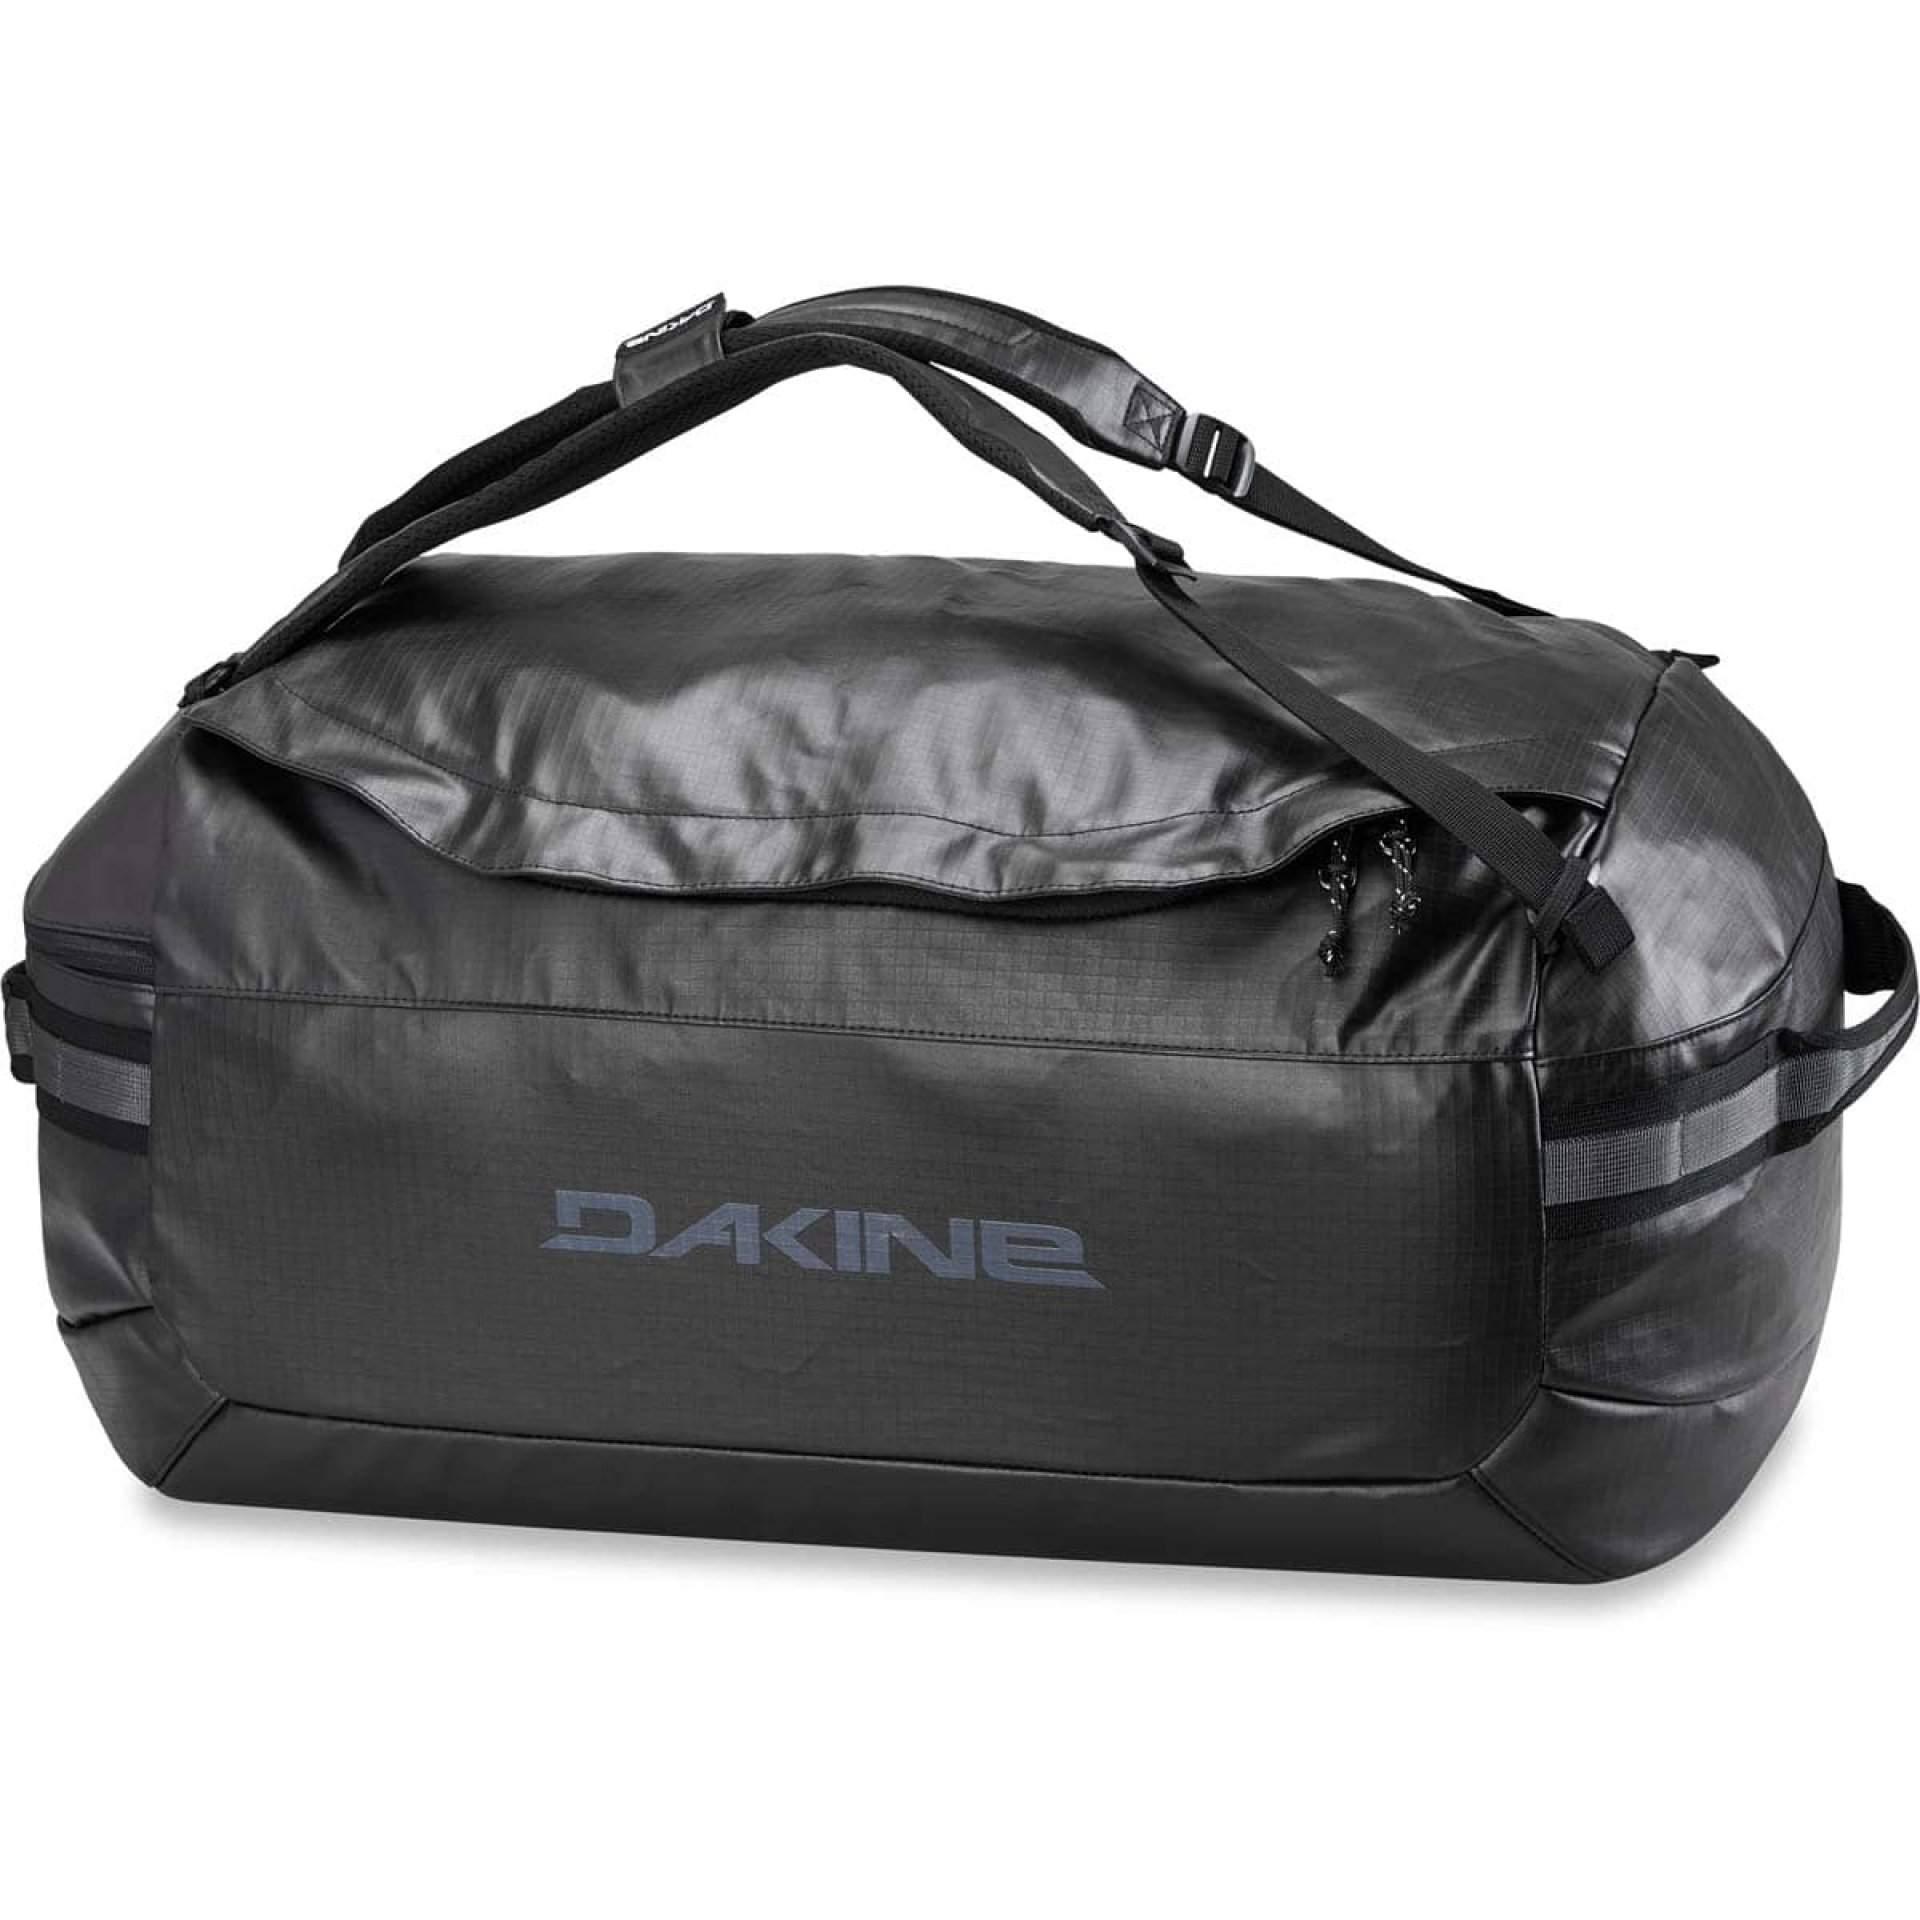 TORBA DAKINE RANGER DUFFLE 90L BLACK 1